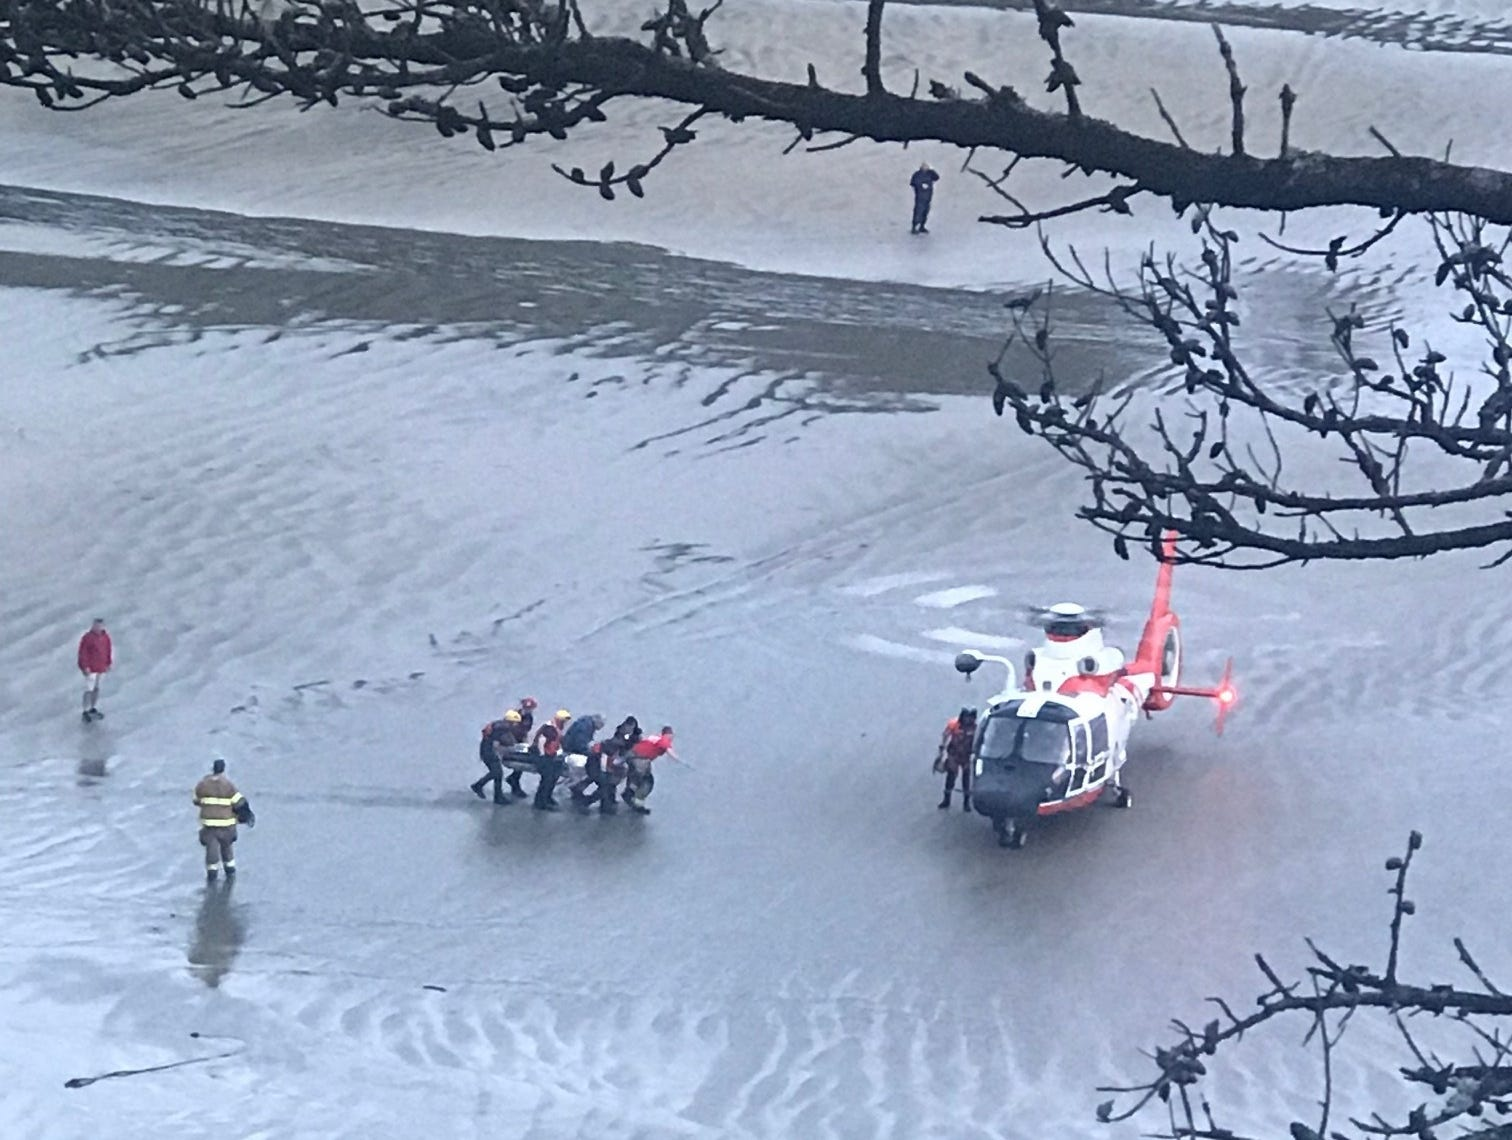 Unconscious Surfer Rescued By Coast Guard Near Newport Oregon